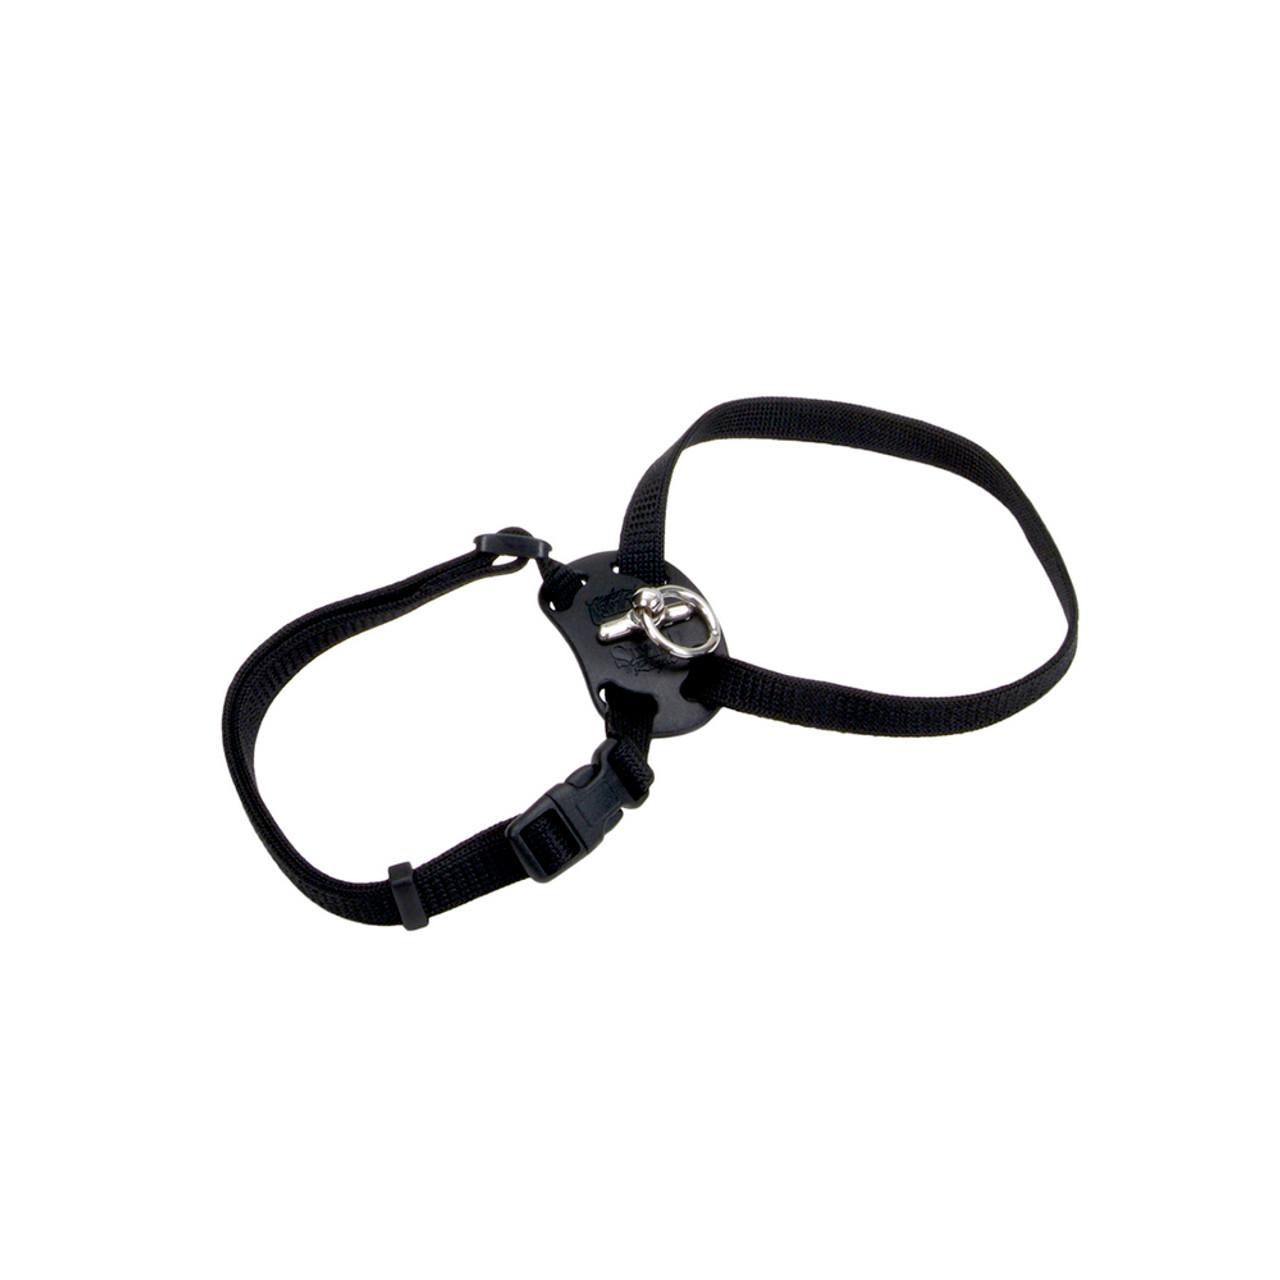 Coastal Size Right Snag-Proof Black Adjustable Cat Harness